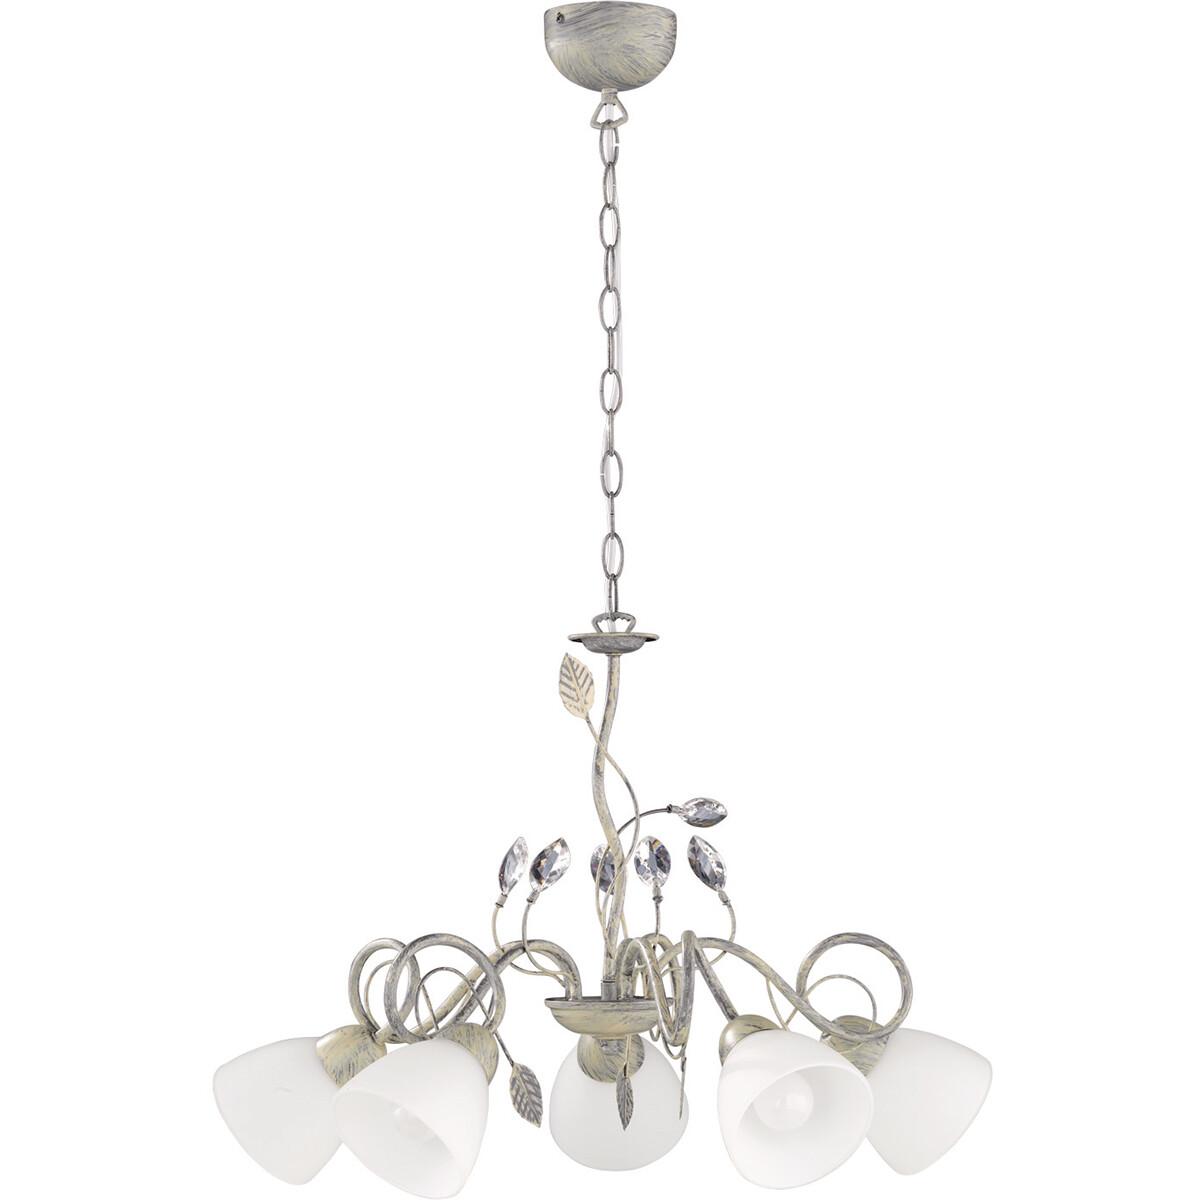 LED Hanglamp - Hangverlichting - Trion Trada - E14 Fitting - 5-lichts - Rond - Antiek Grijs - Alumin